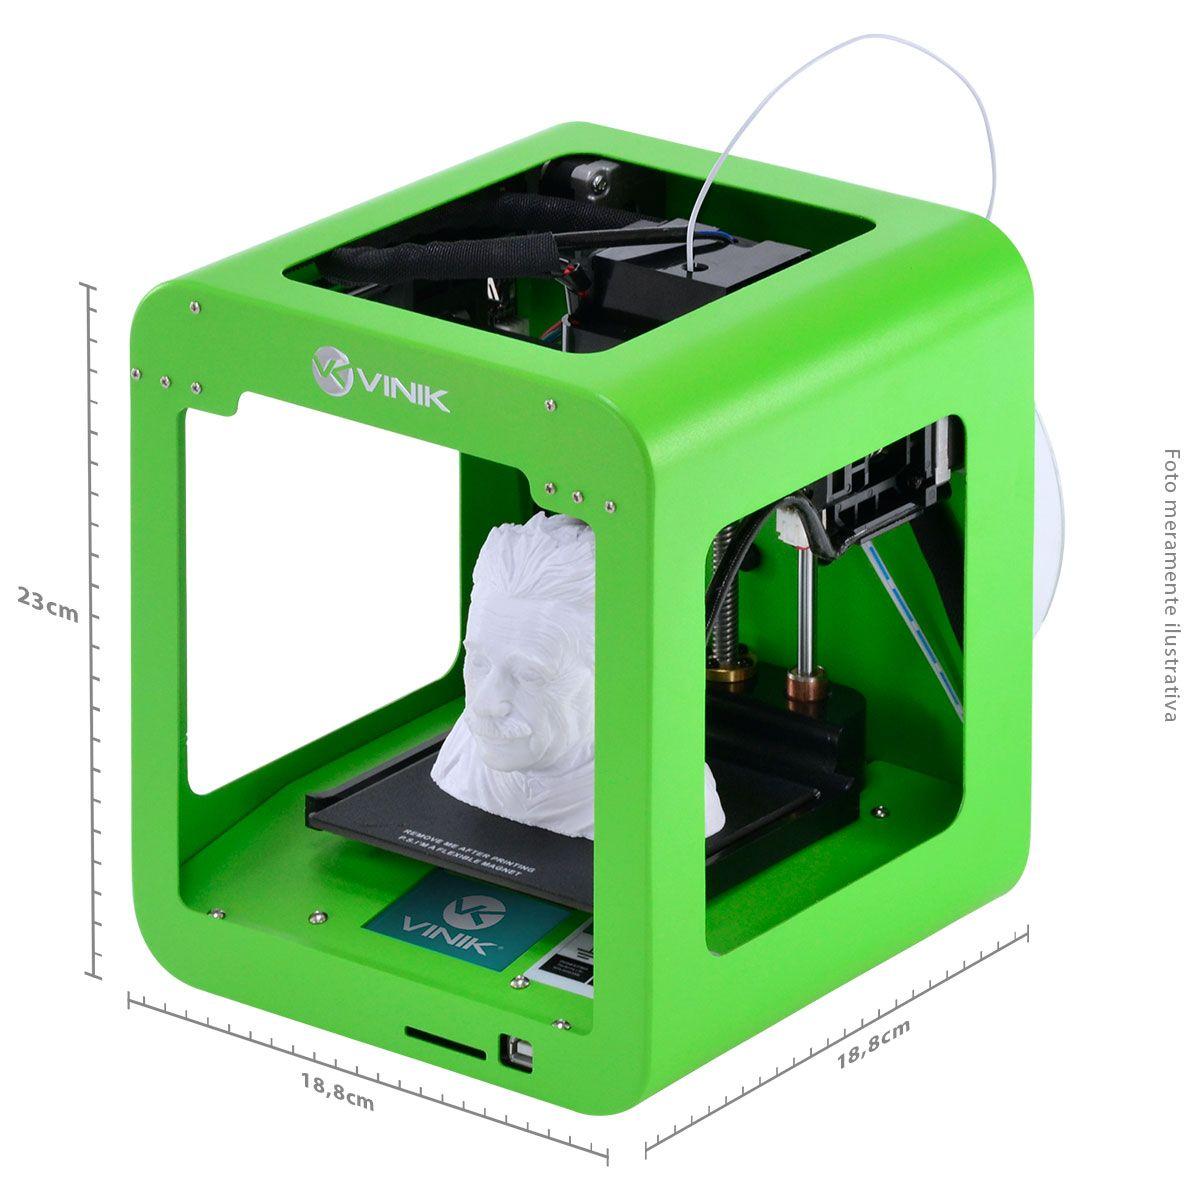 Impressora 3D Creati.V - VINIK